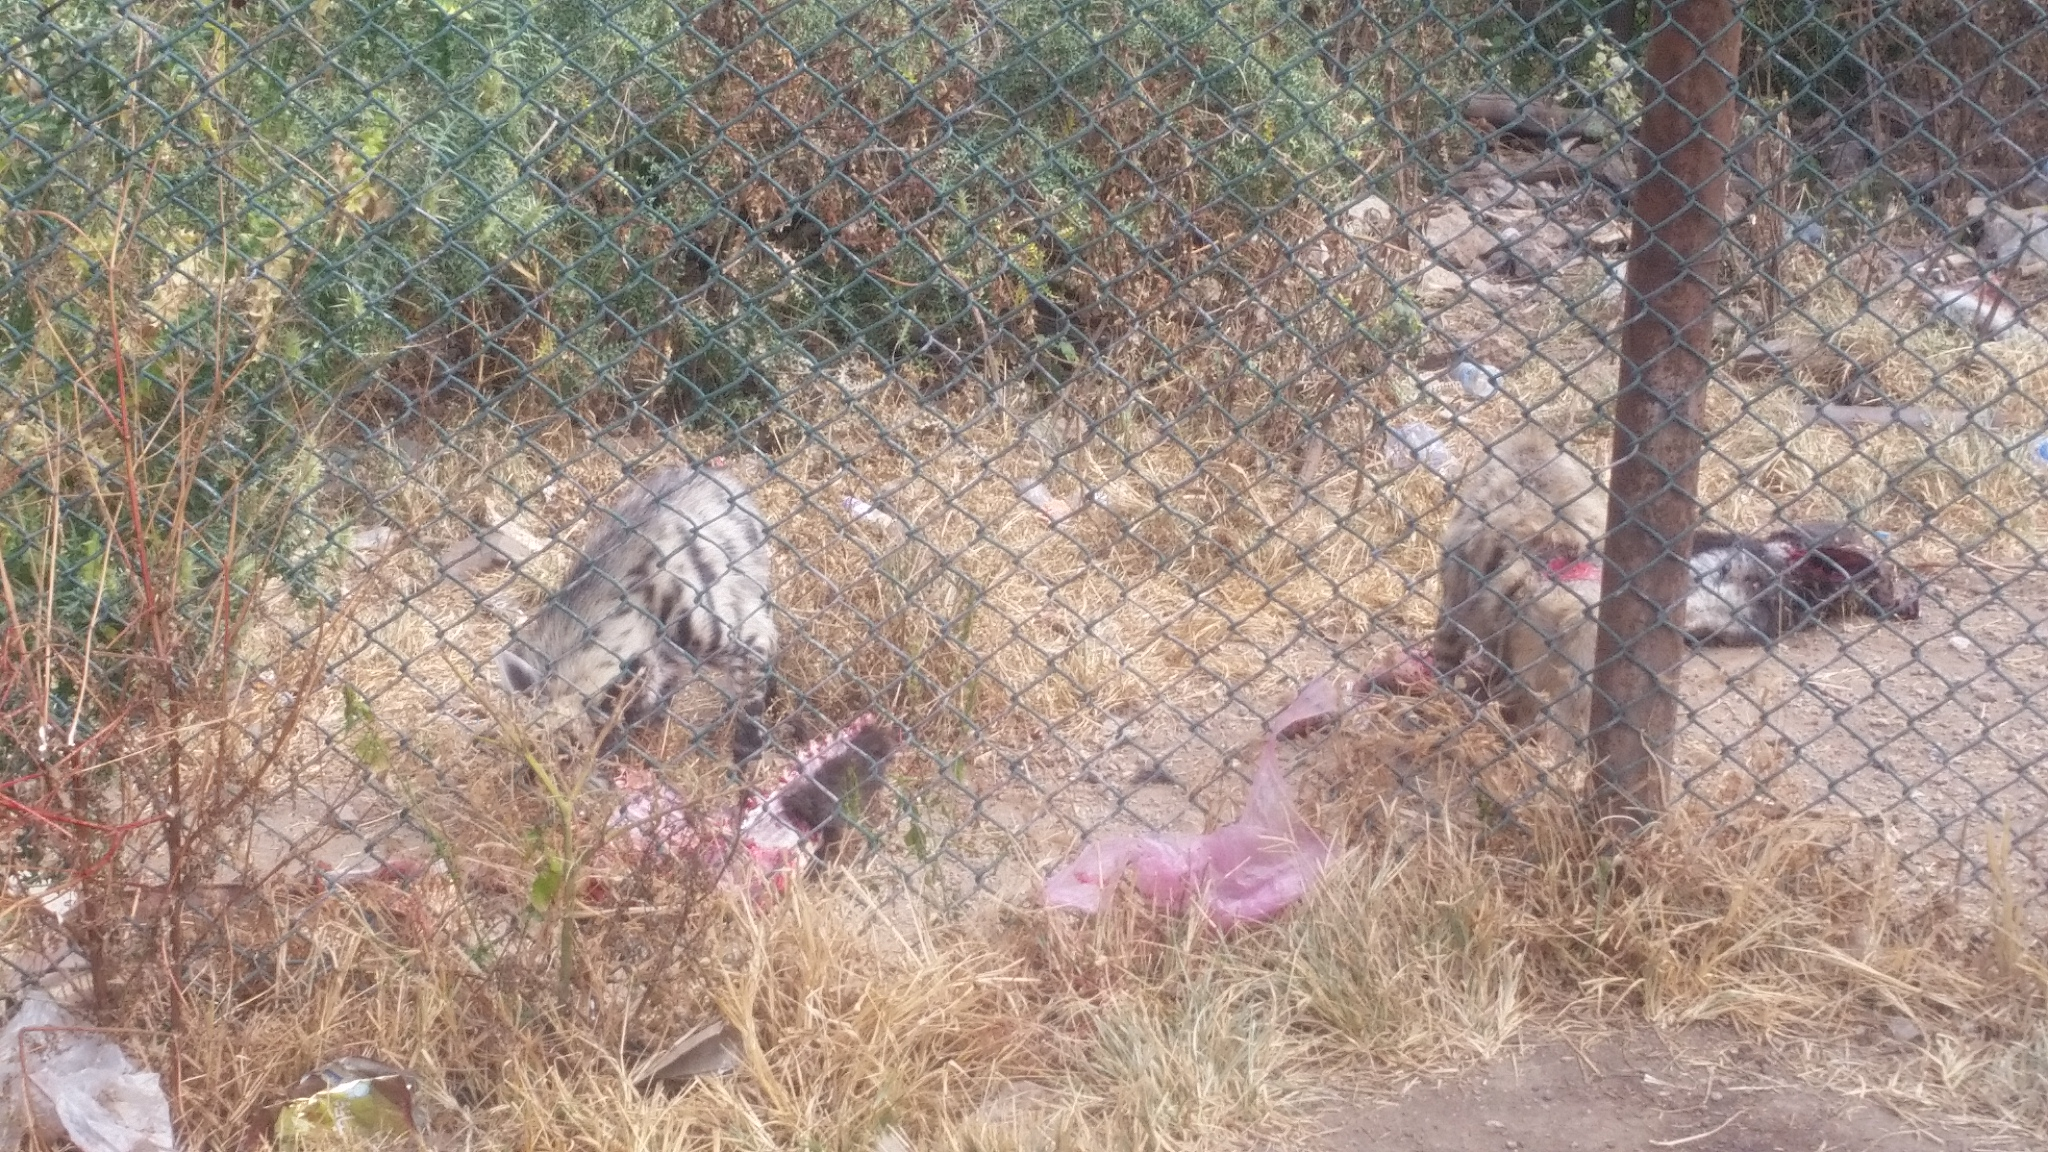 ibb zoo the other 2 Hyenas eating OWAPAR's delivery 7 NOV 2018 yemen zoo rescue.jpg